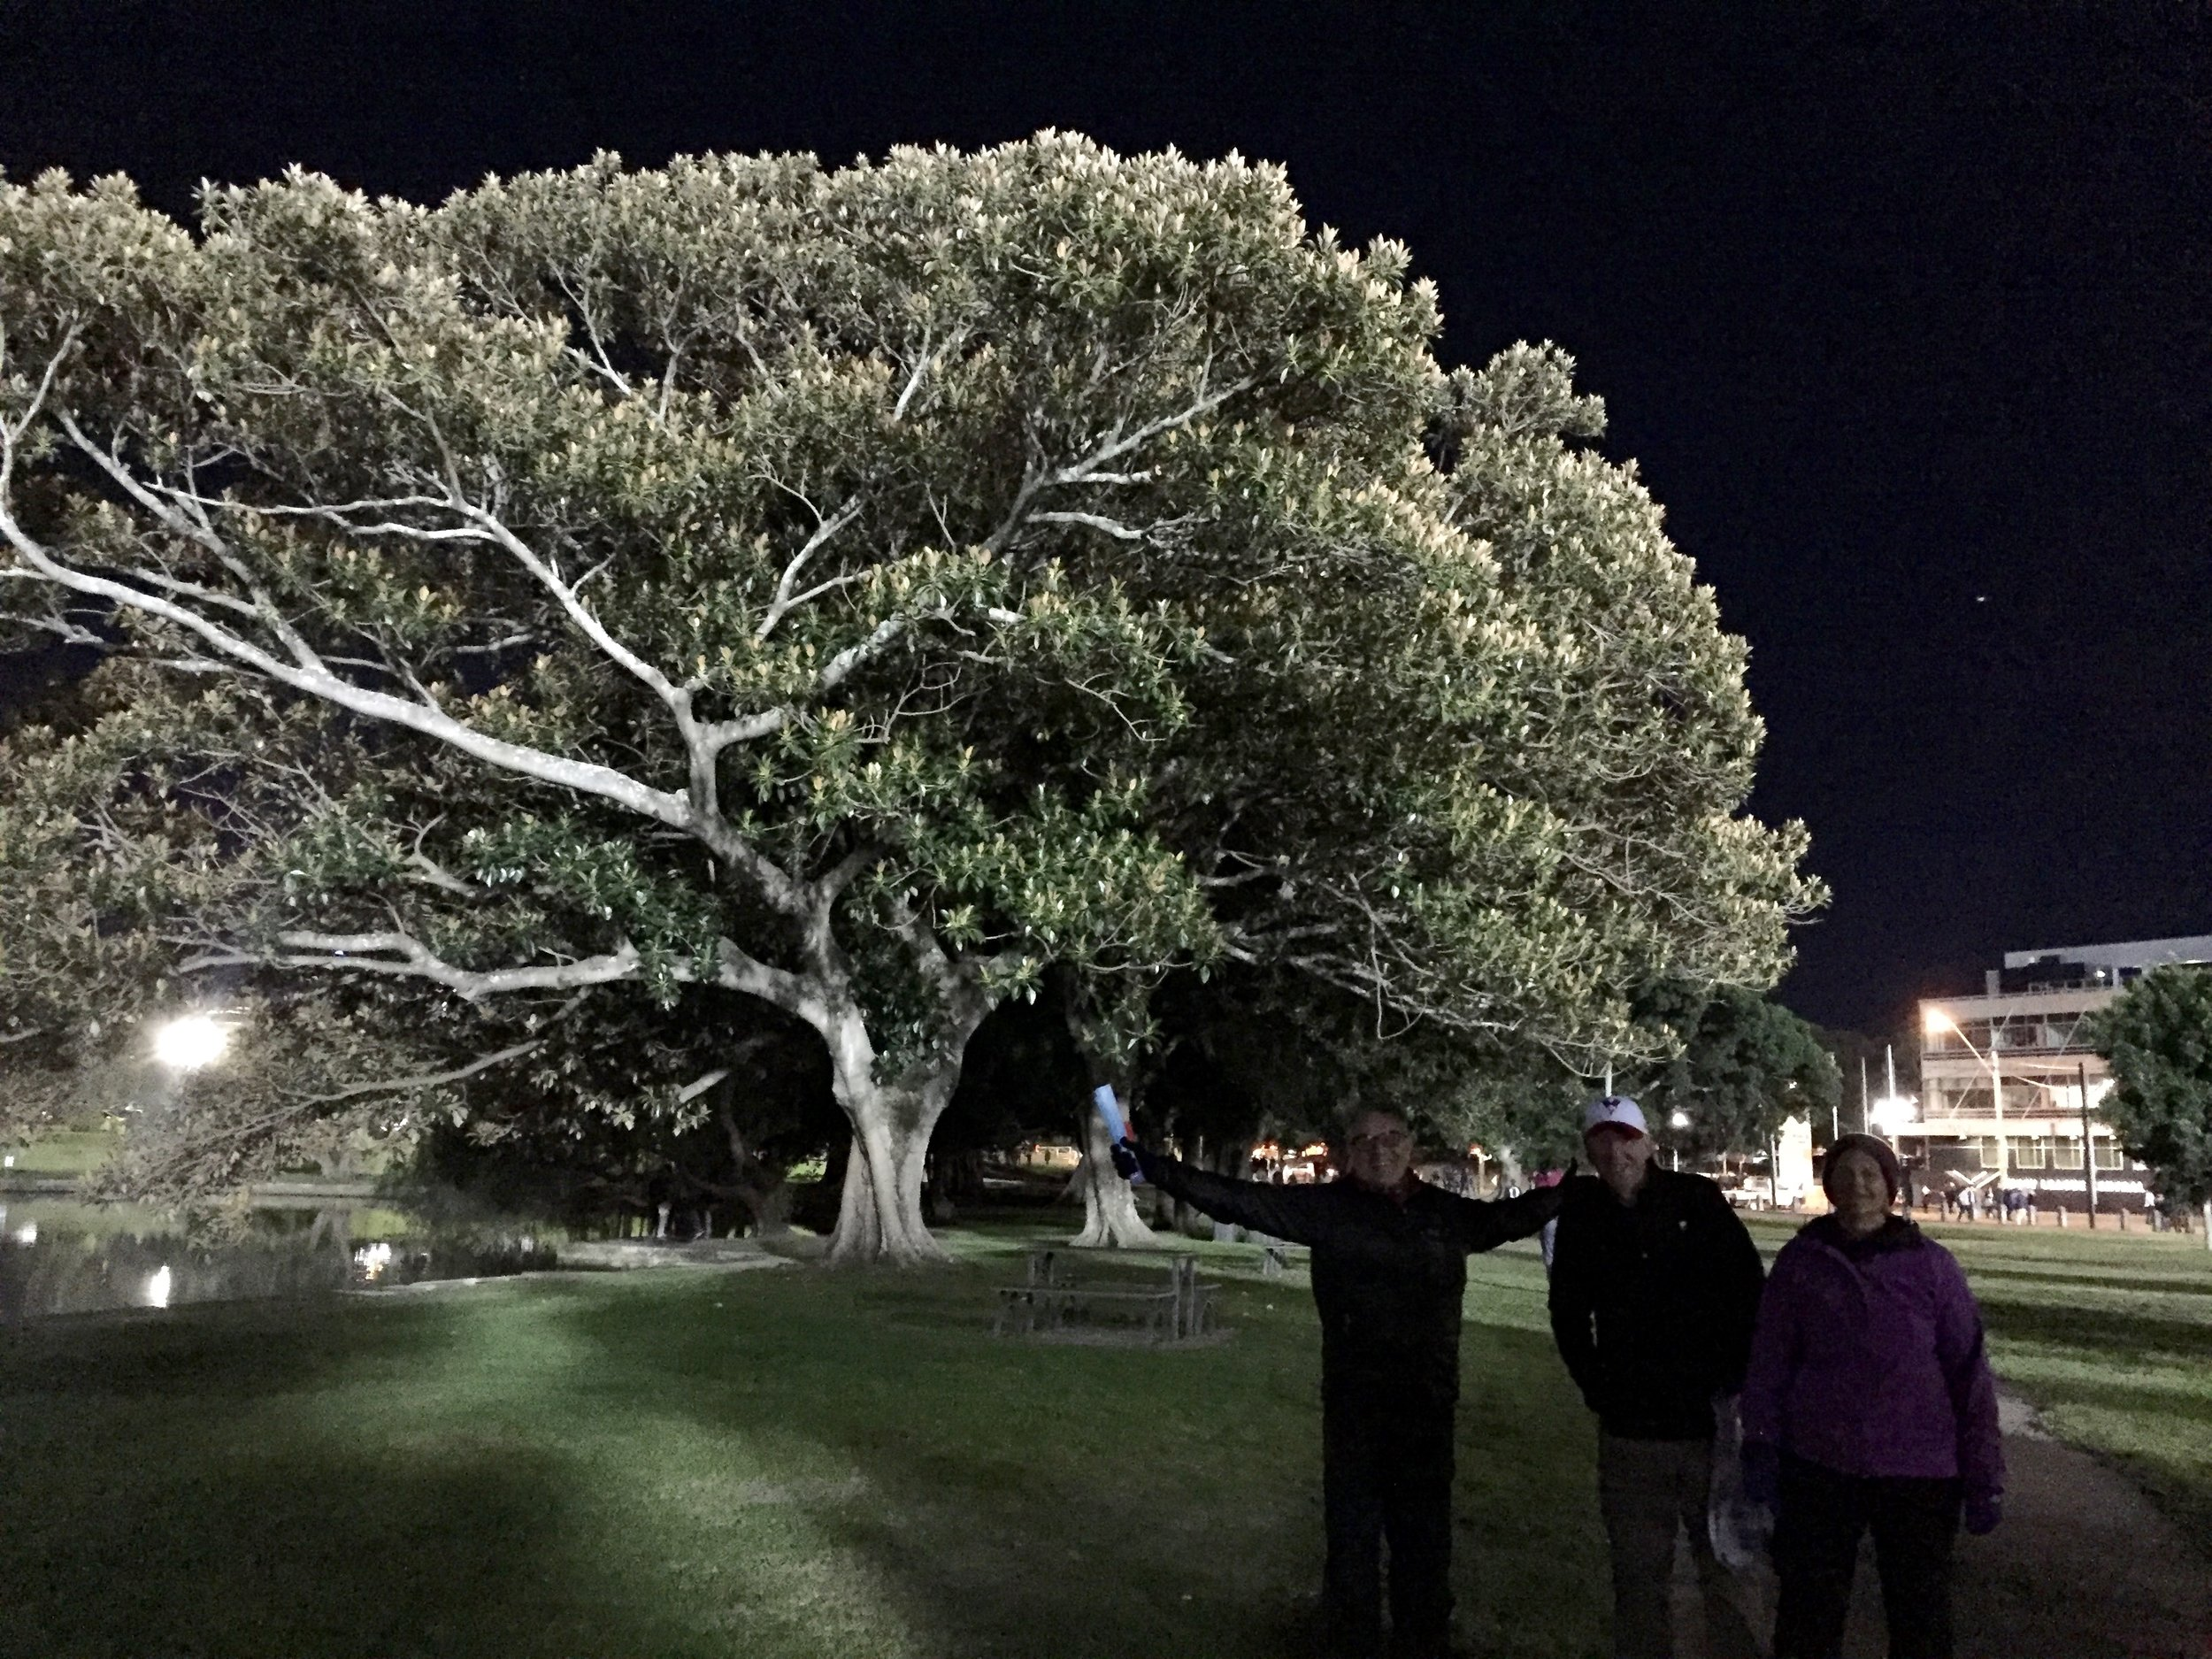 One of Sydney's weird trees